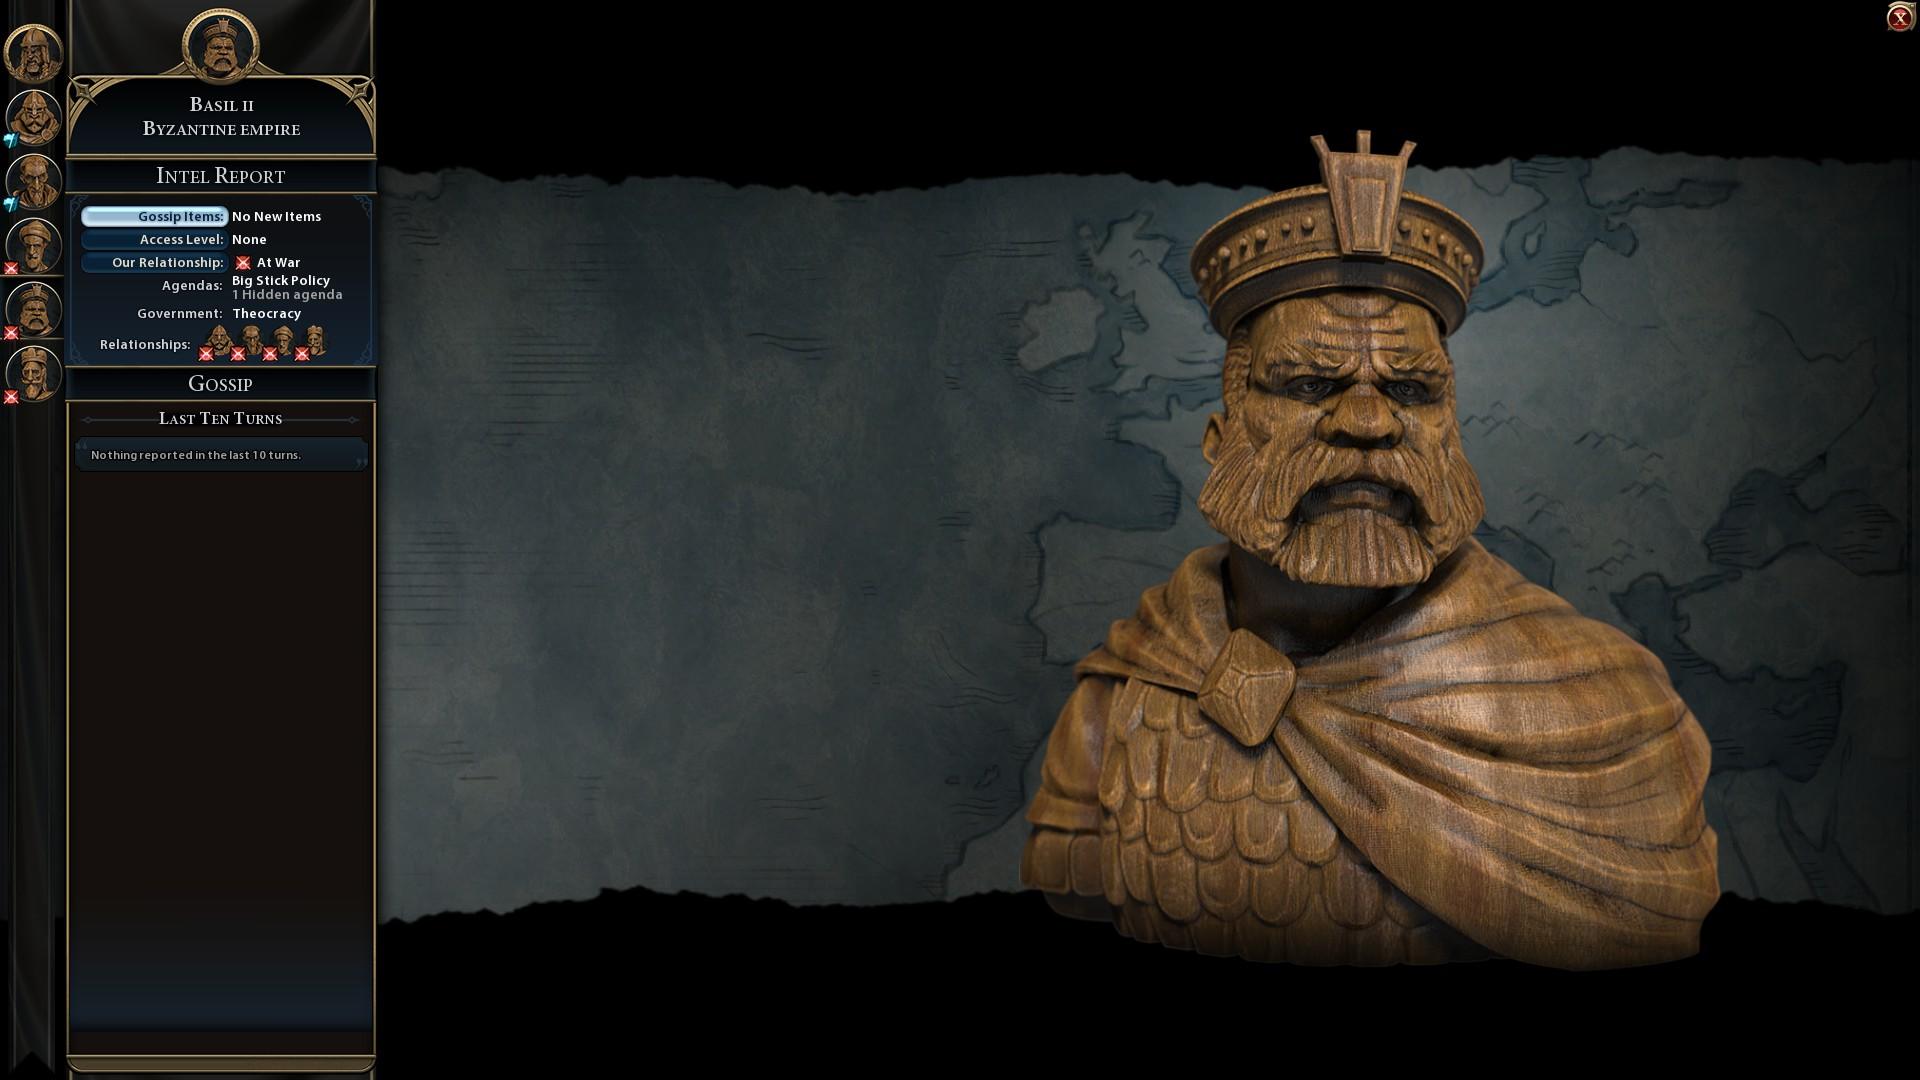 Basil II diplomacy.jpg